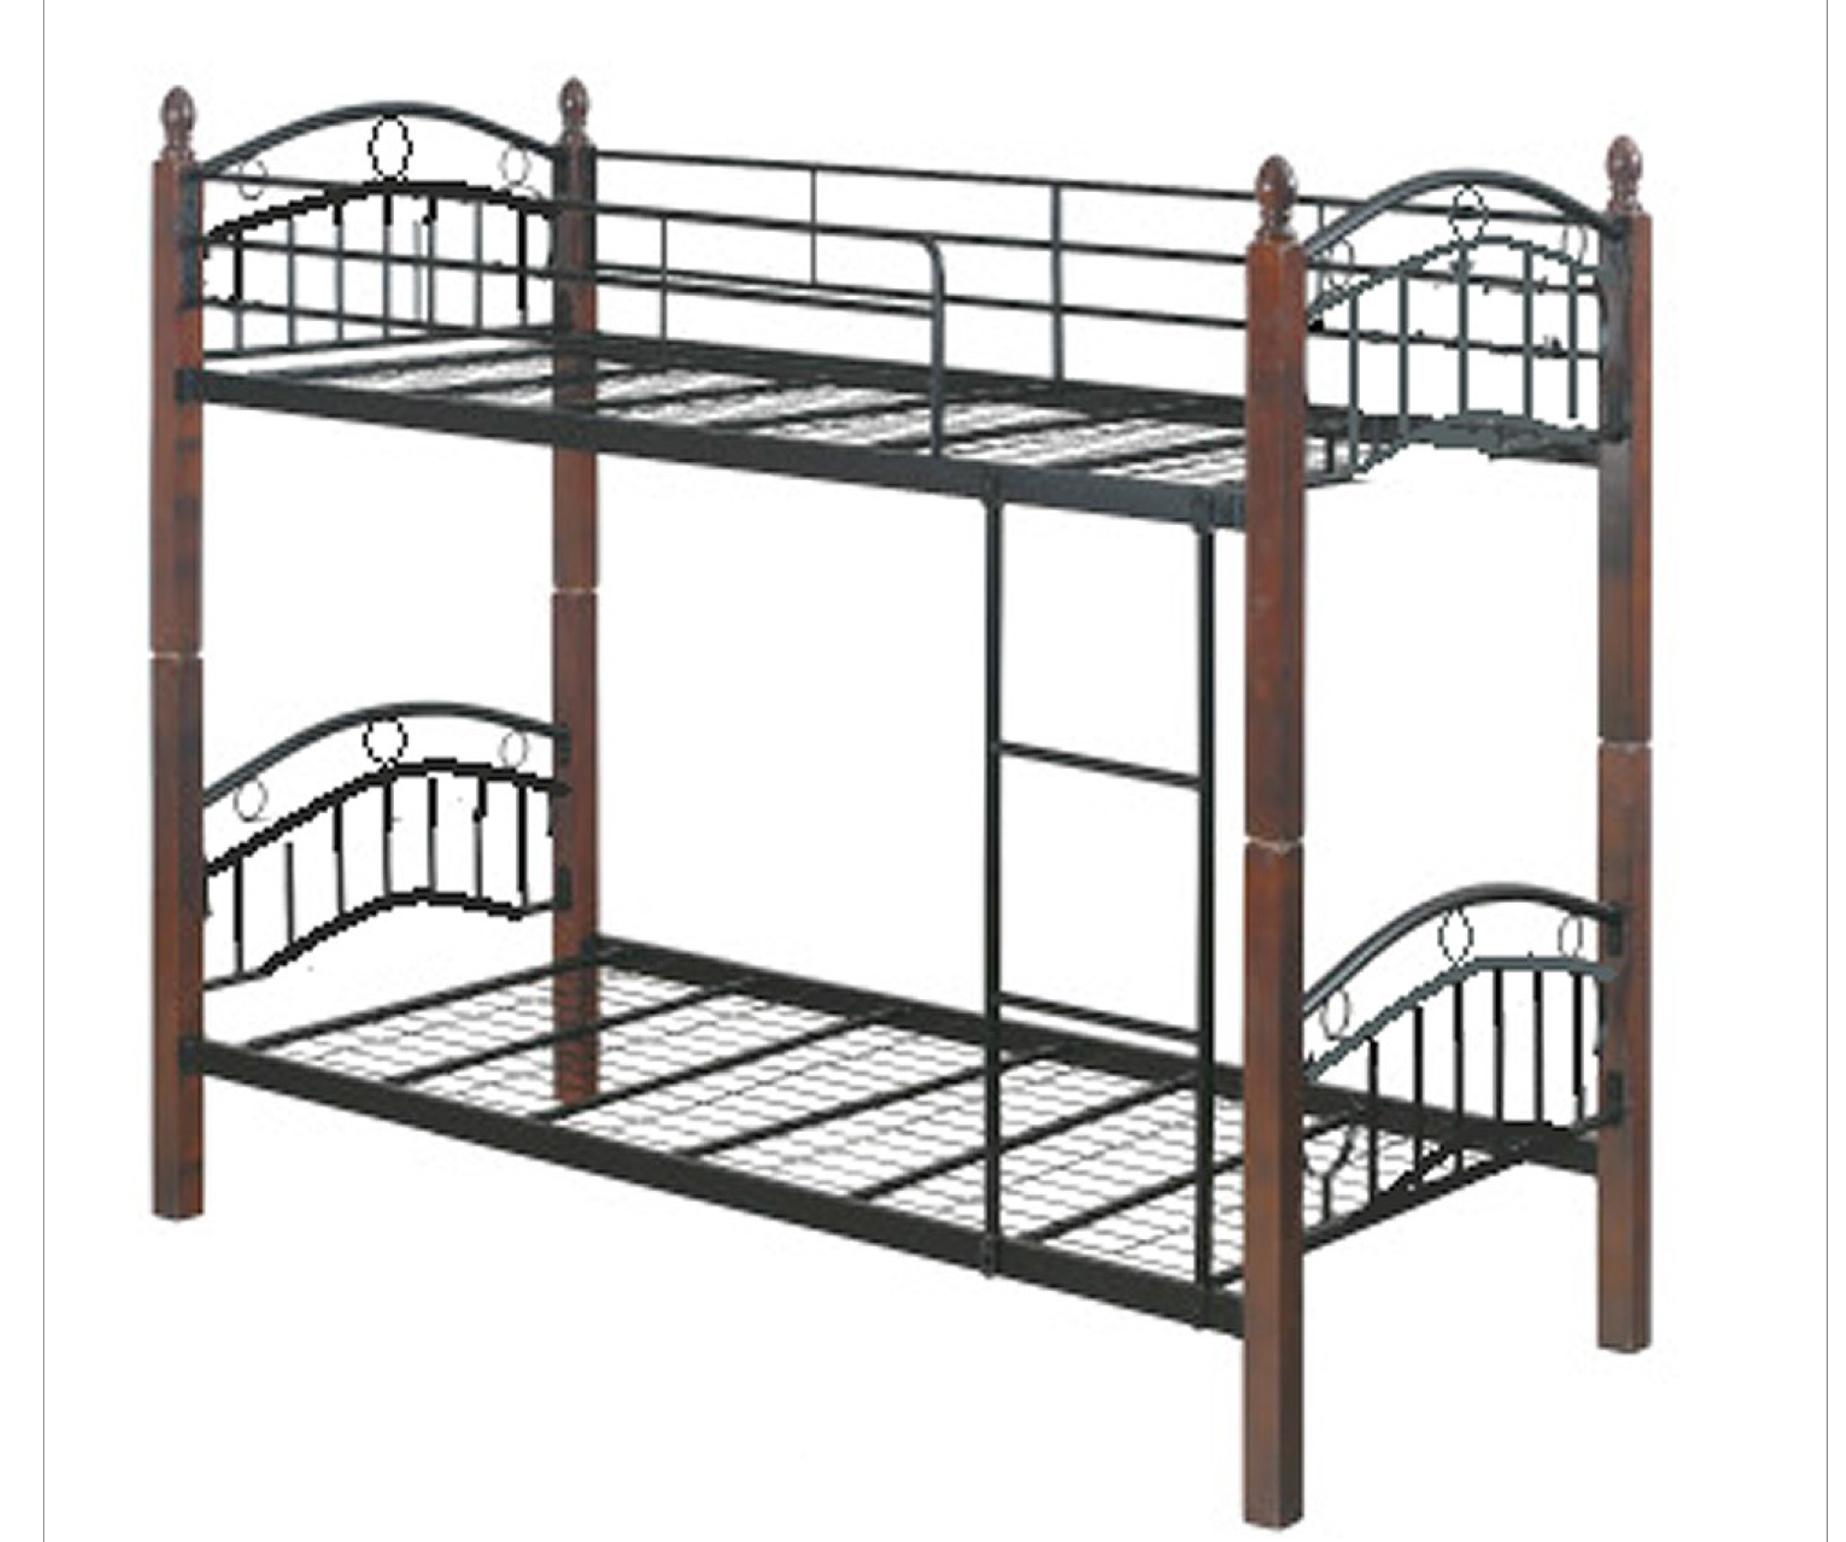 Double deck bed design crowdbuild for - Double decker bed ...